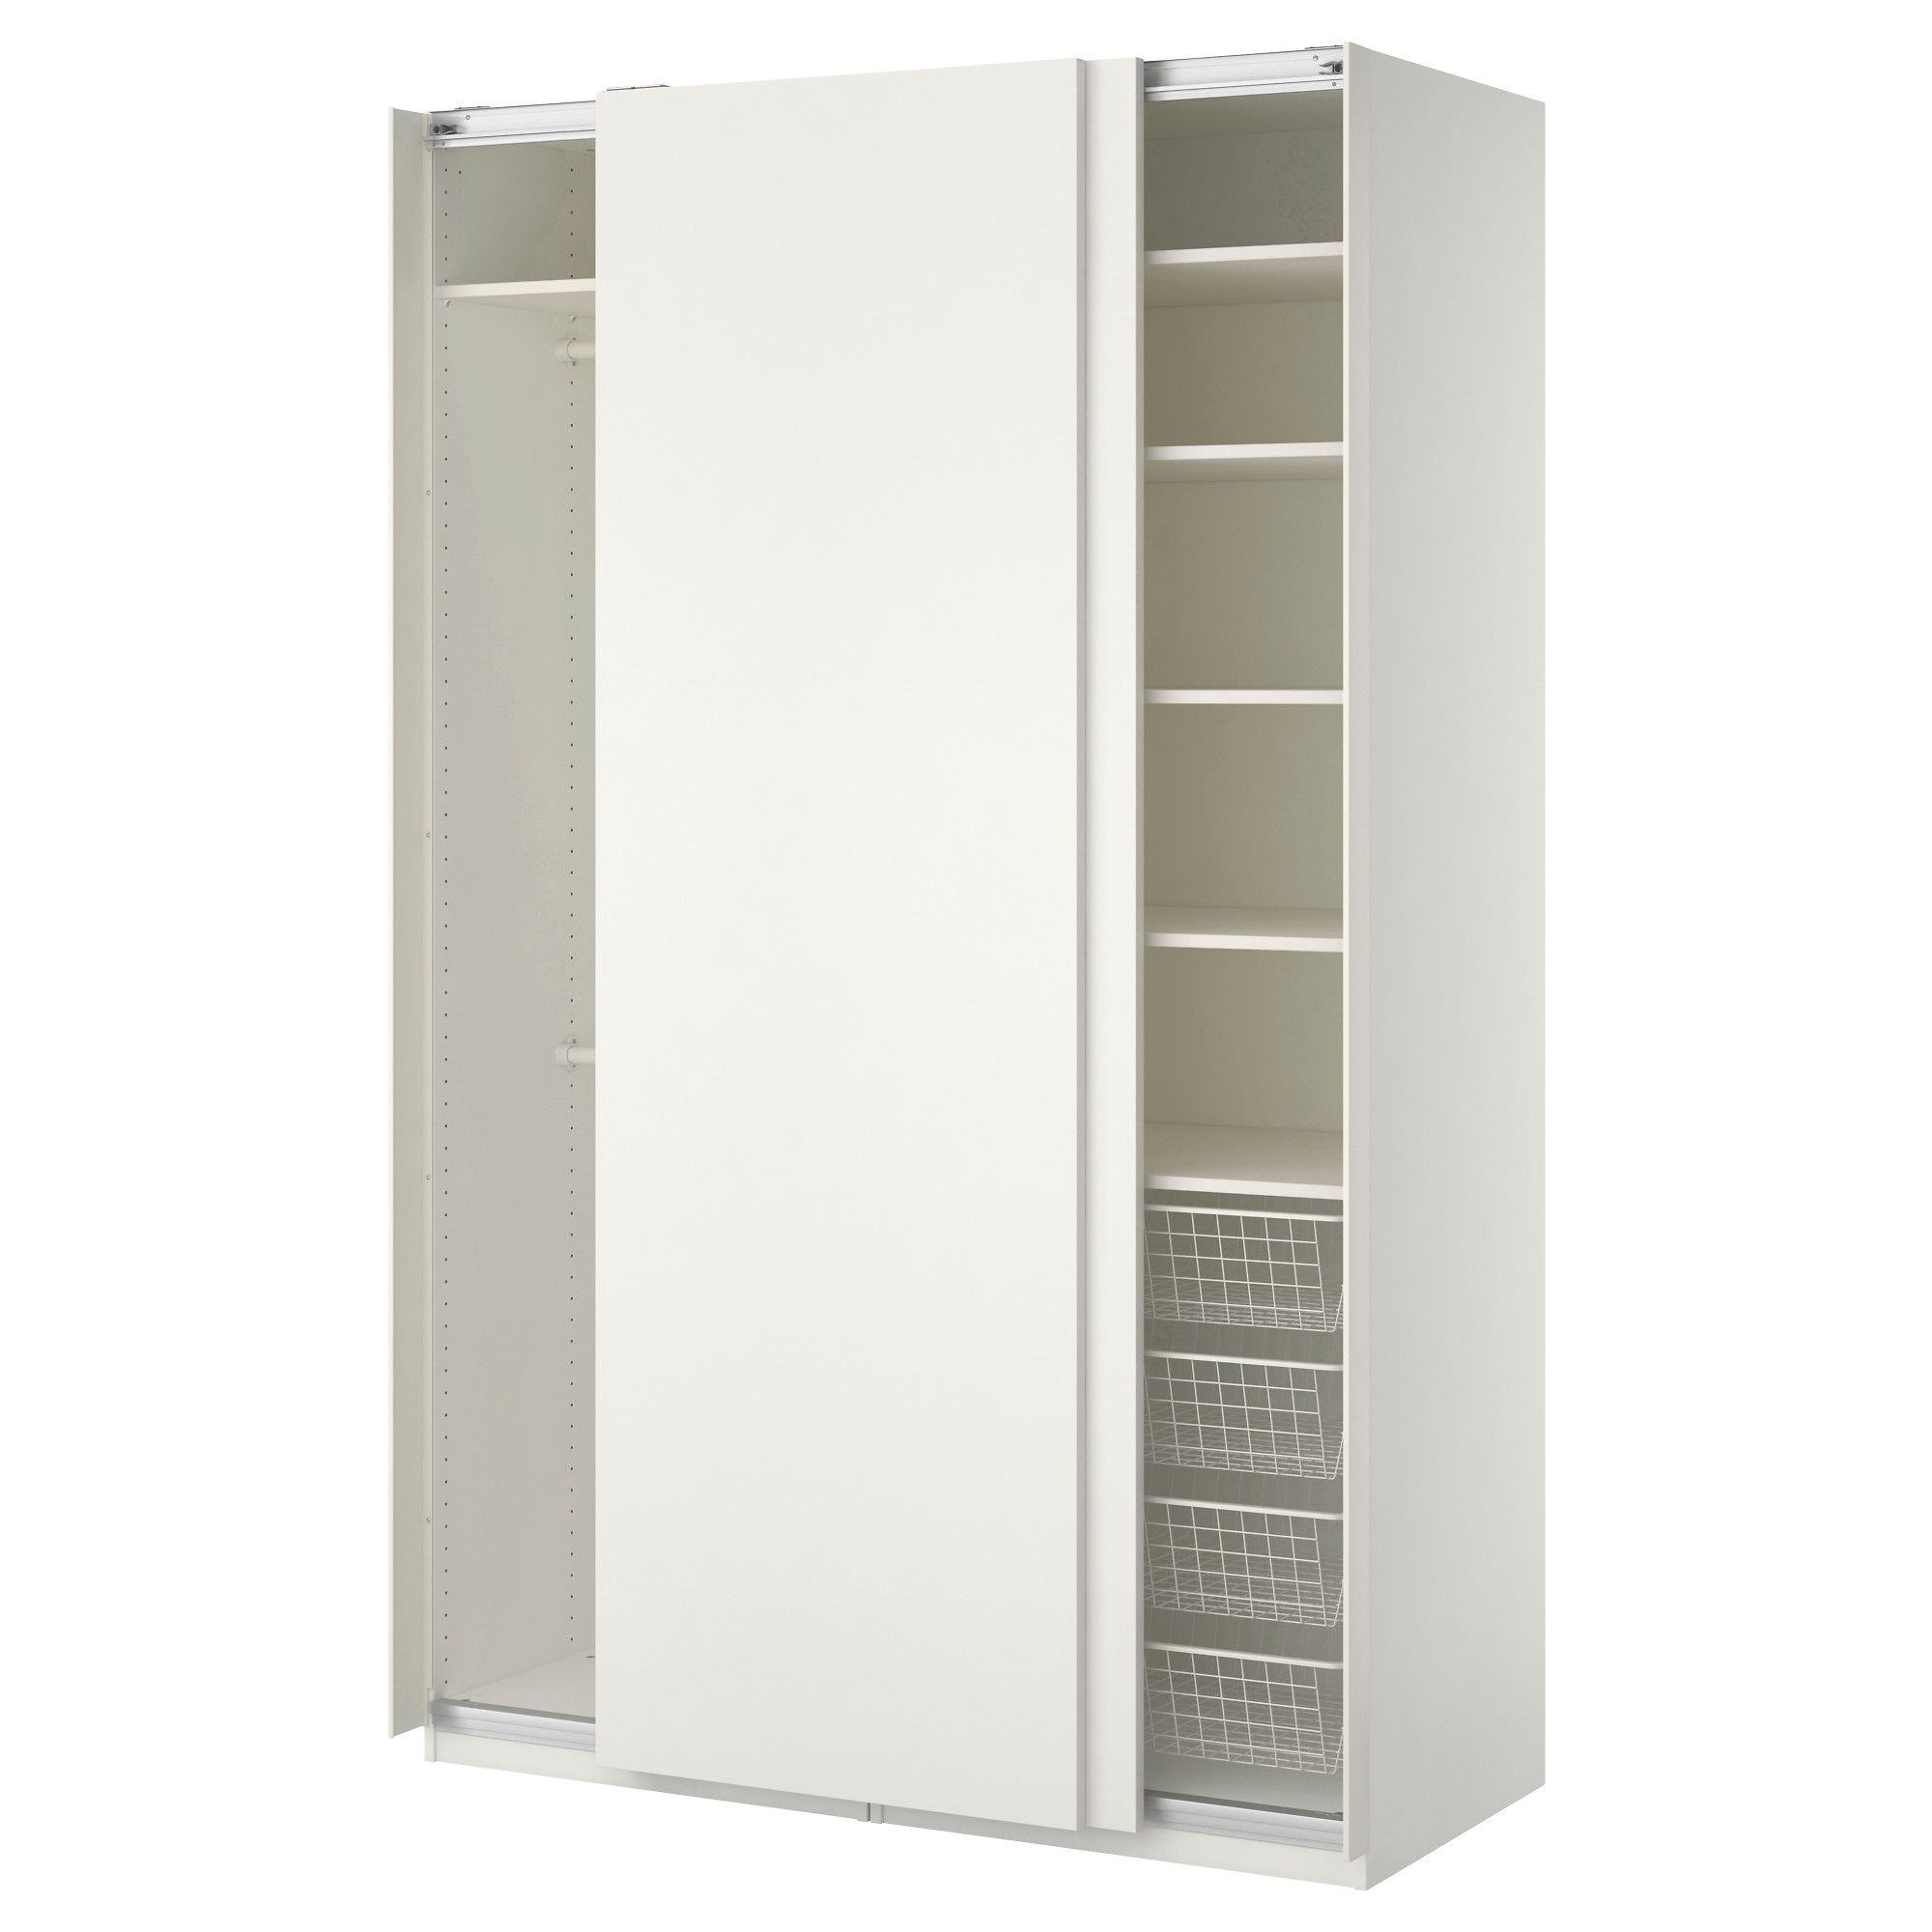 MORVIK Armoire penderie blanc miroir IKEA